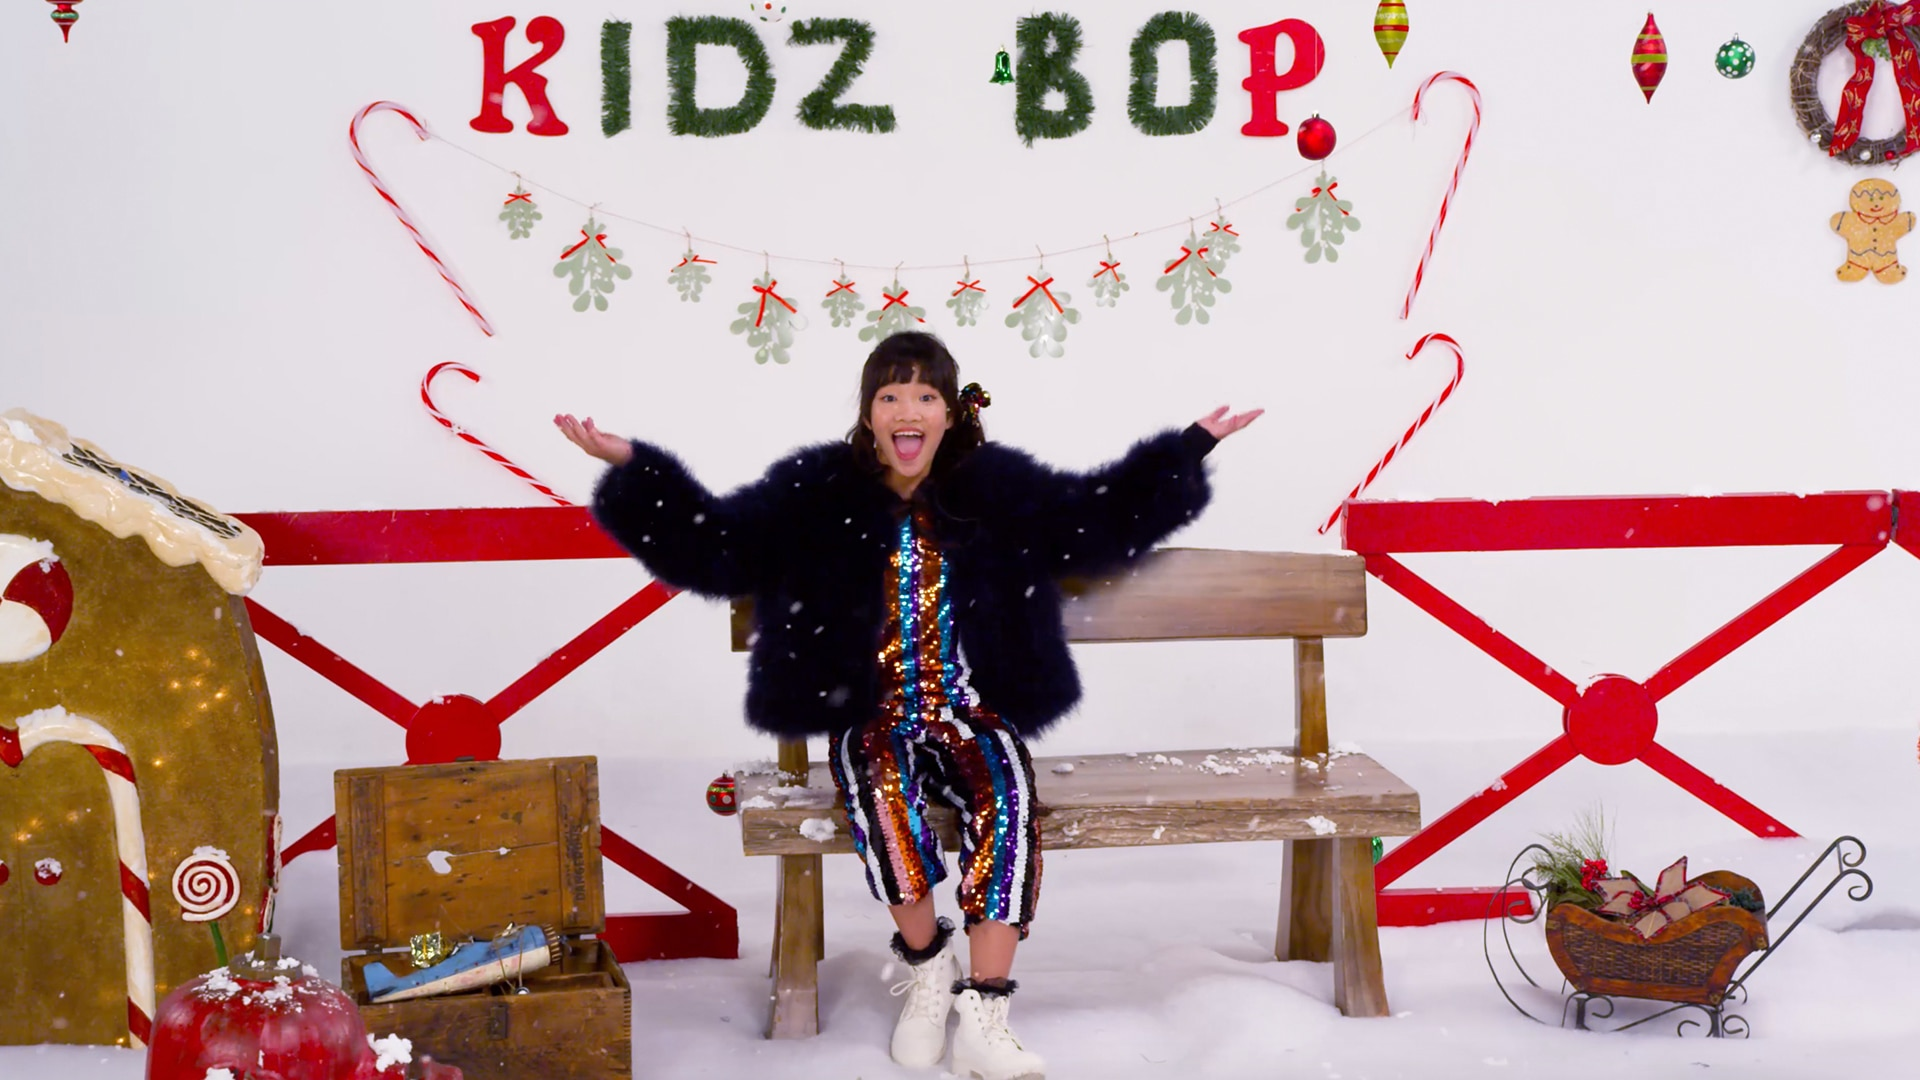 Kidz Bop Kids - Santa Tell Me